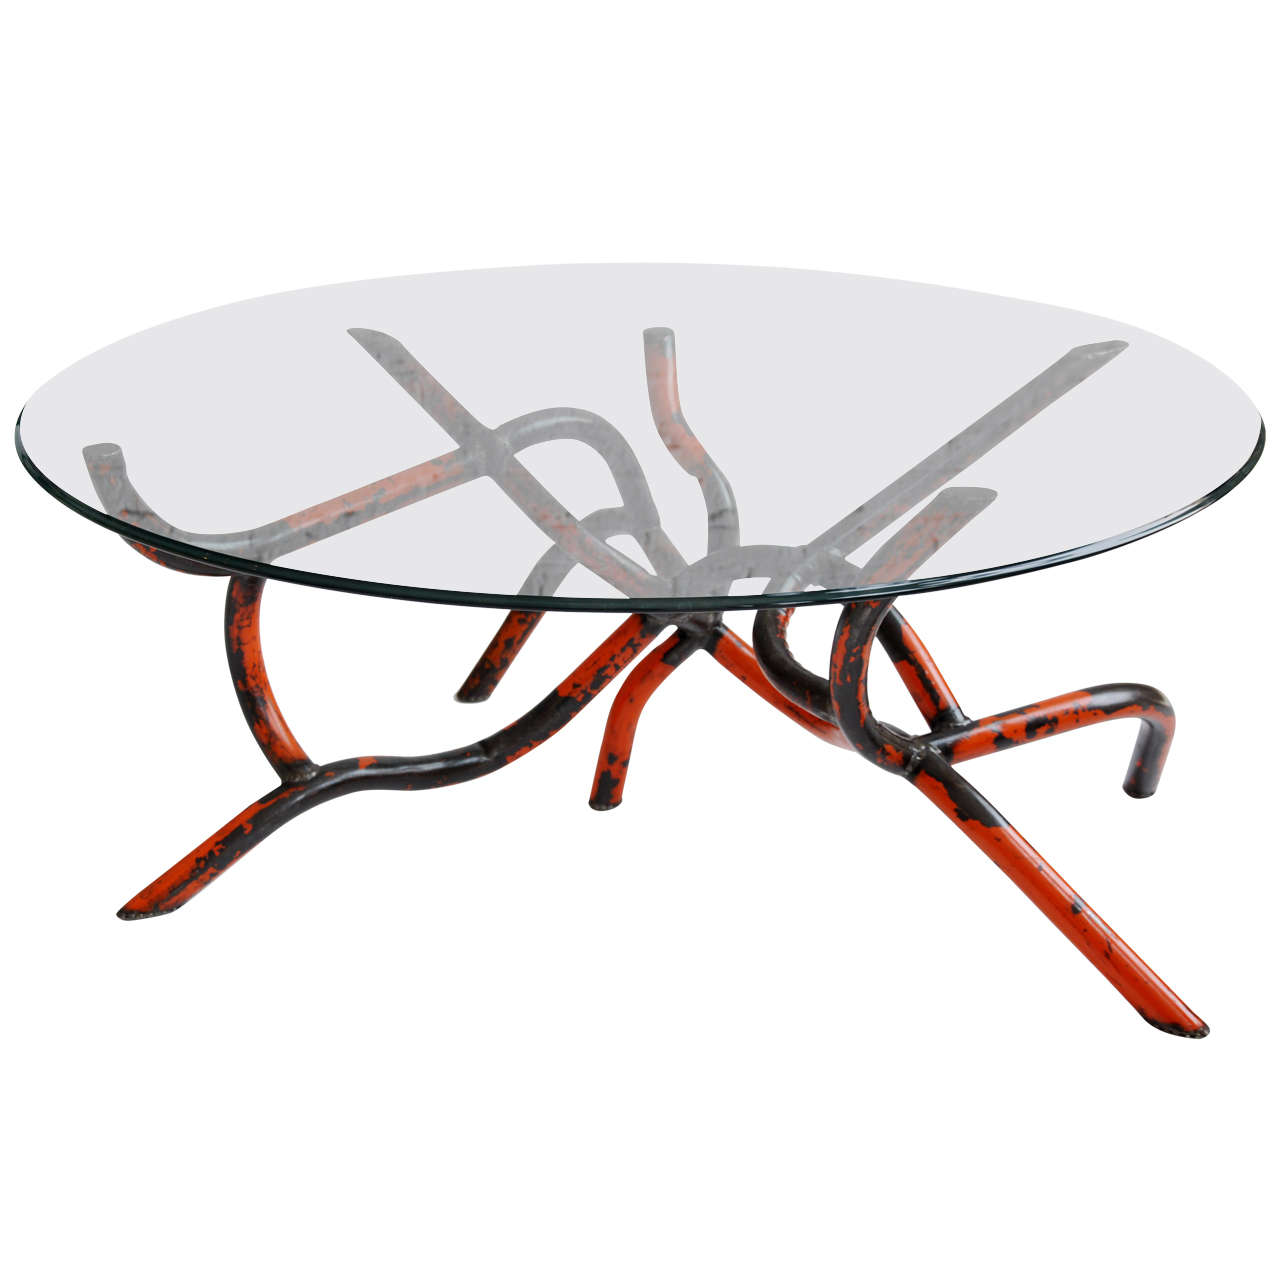 Orange worm coffee table at 1stdibs for Orange coffee table